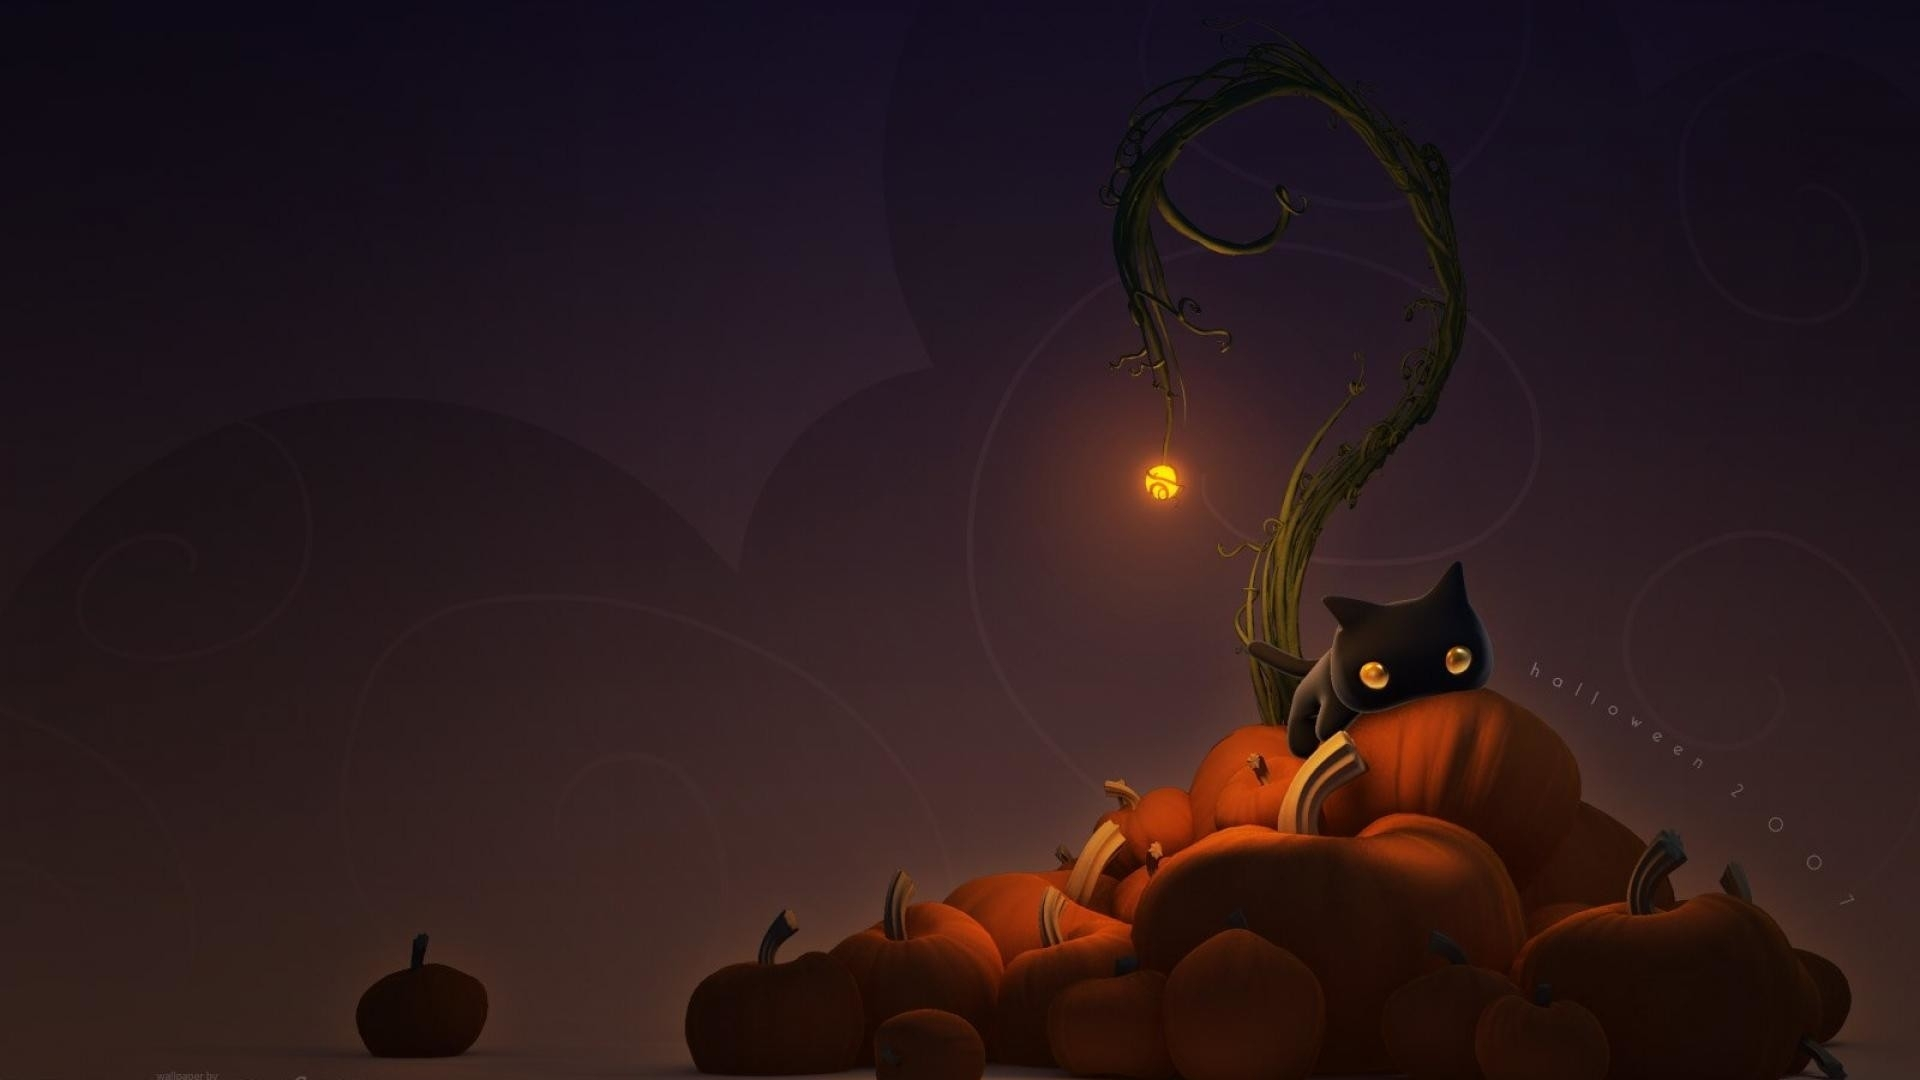 cute cat halloween wallpaper (65+ images)